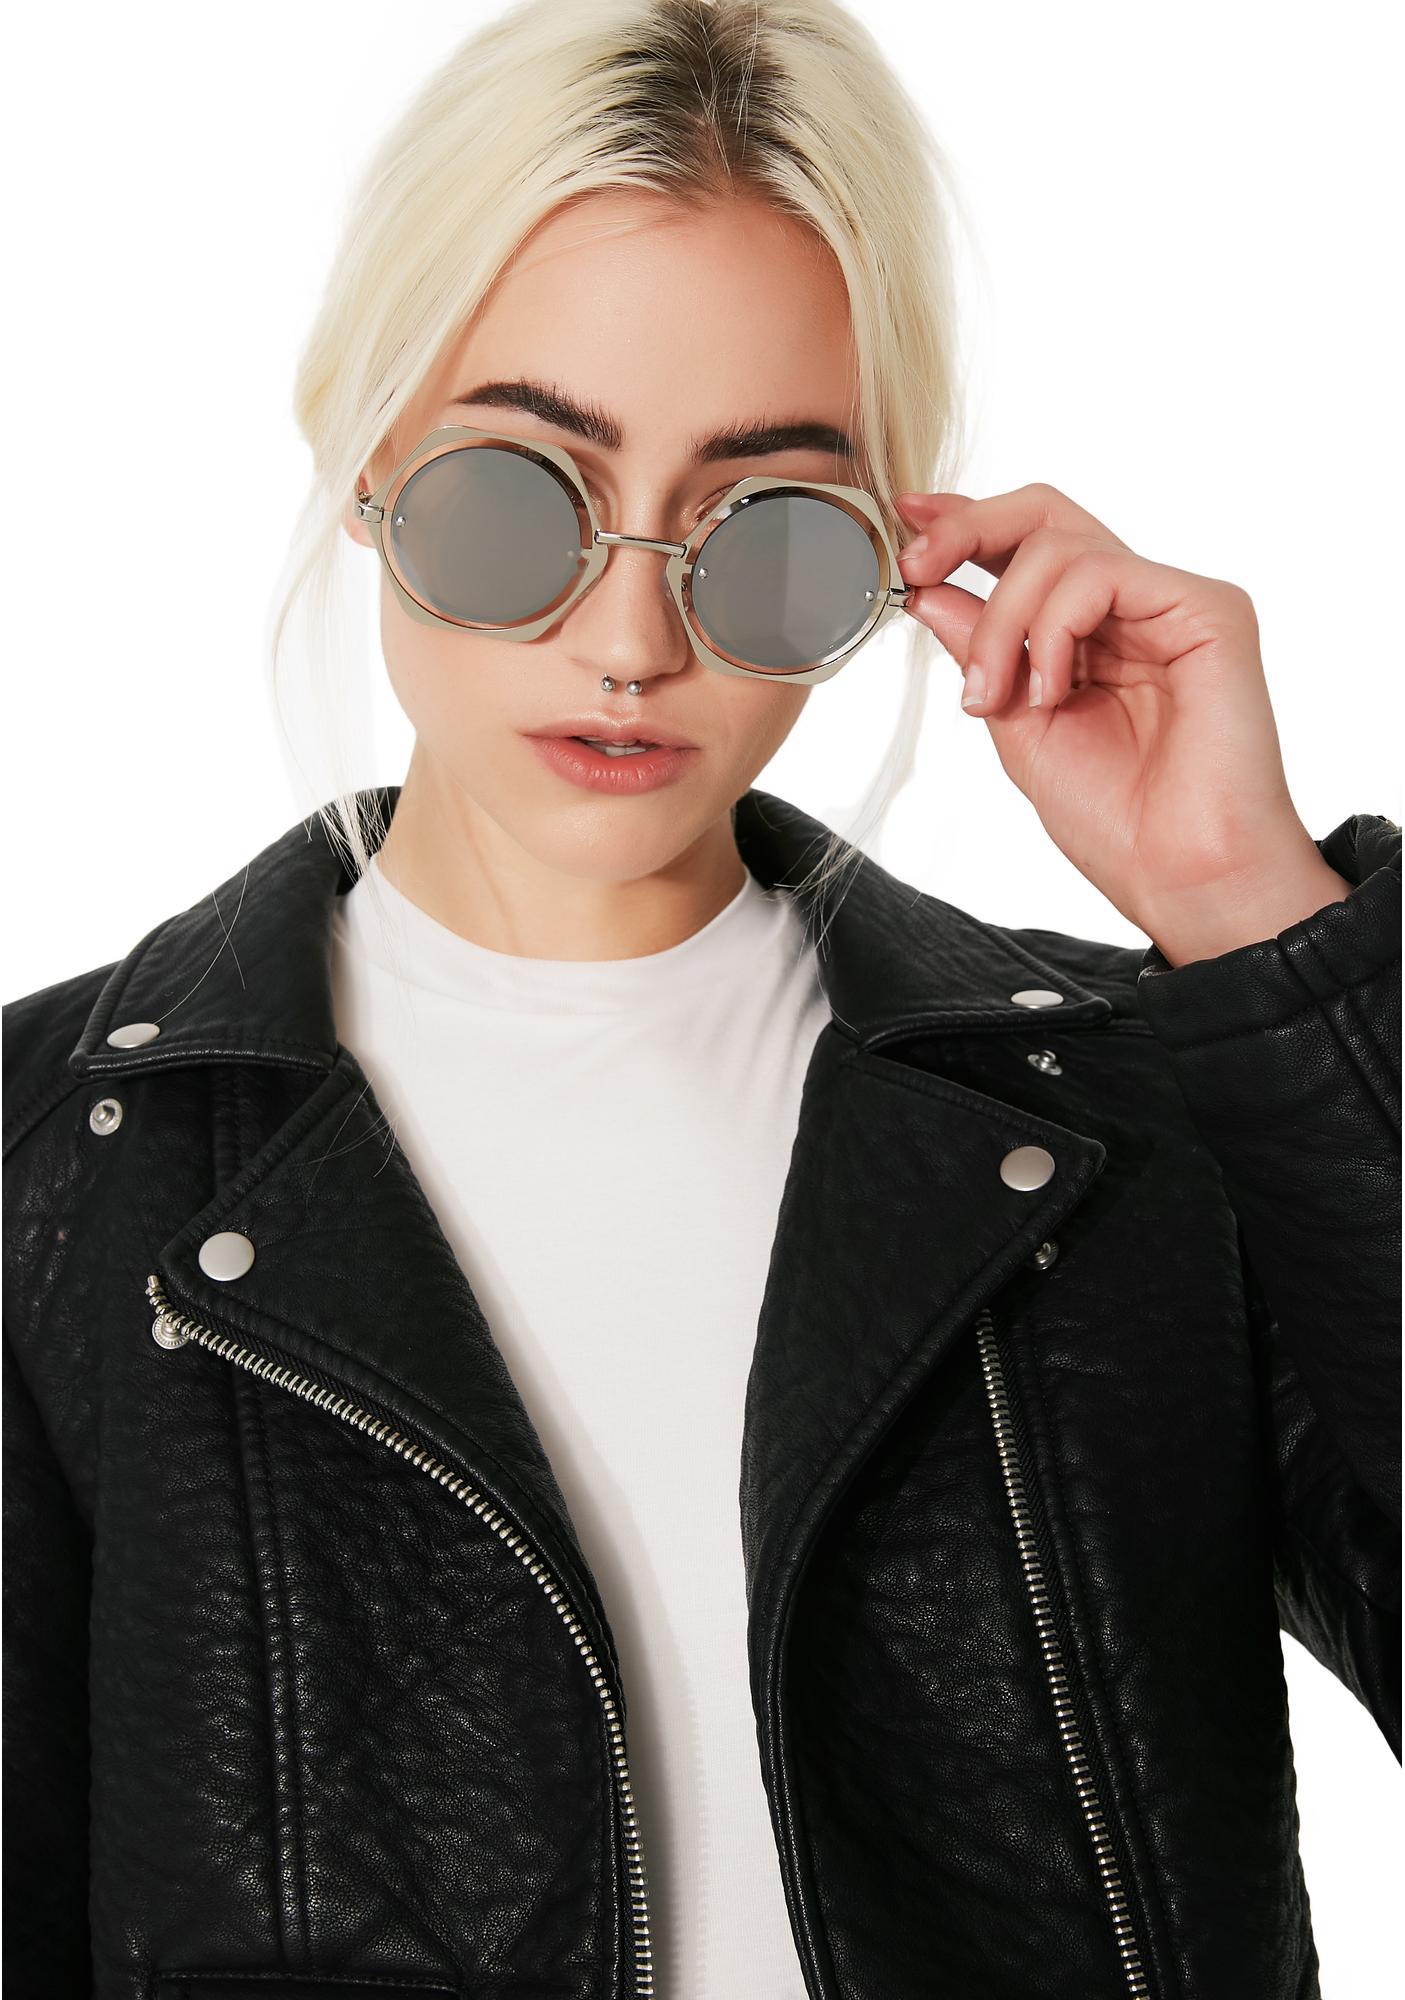 PERVERSE Man Crush Monday Sunglasses